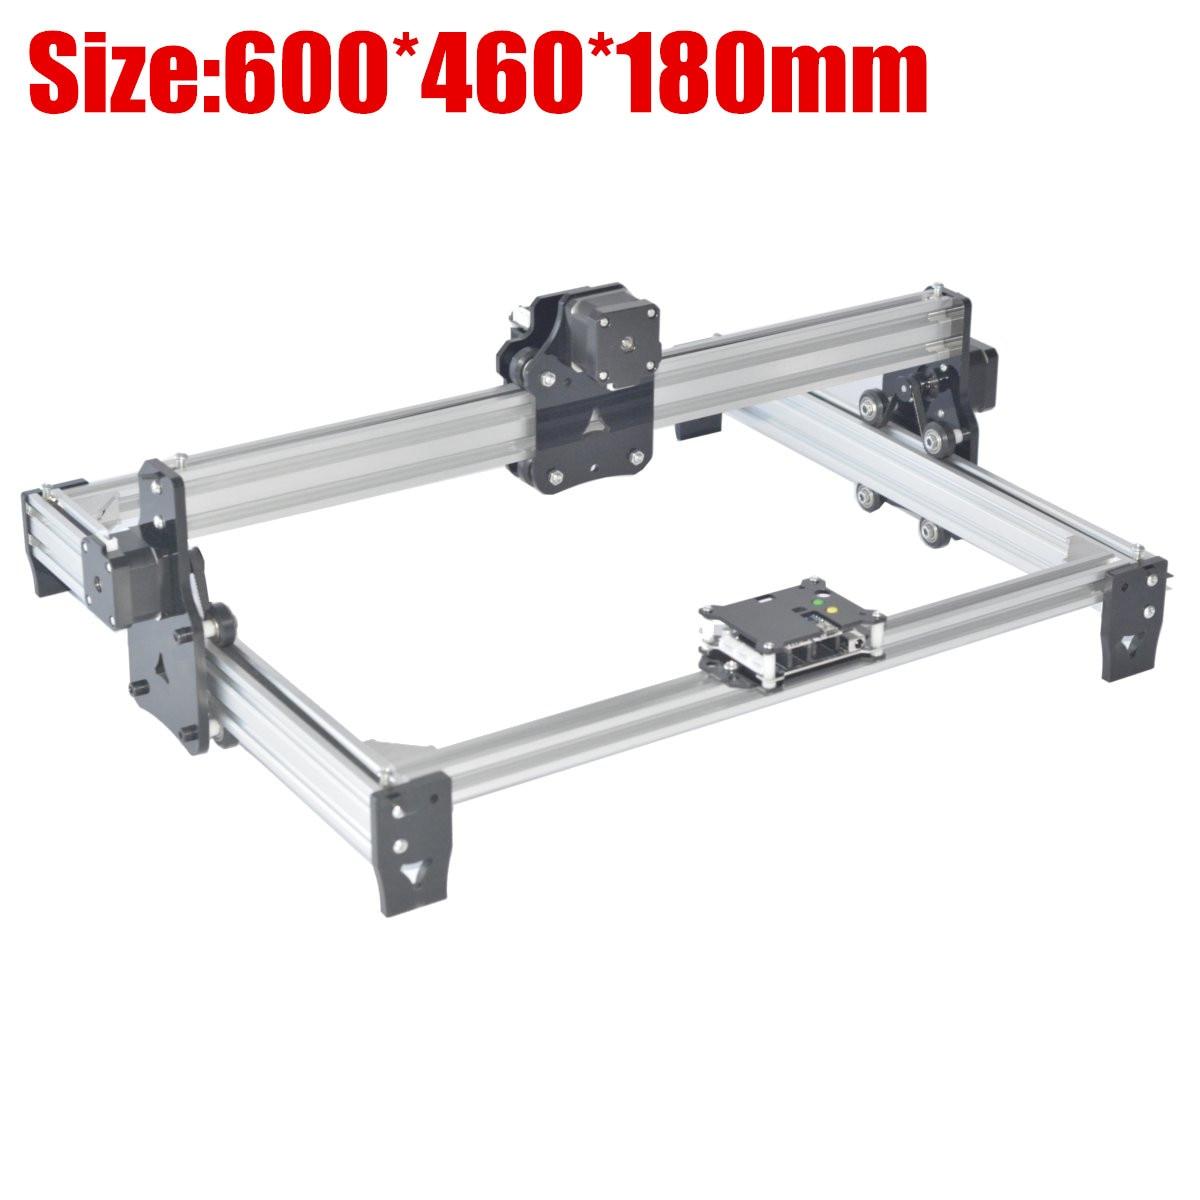 2500mw DVP 3830 Laser A3 Engraving Machine,DIY Laser Engraver Machine,Wood Router,laser Cutter,cnc Router,best Advanced Toys